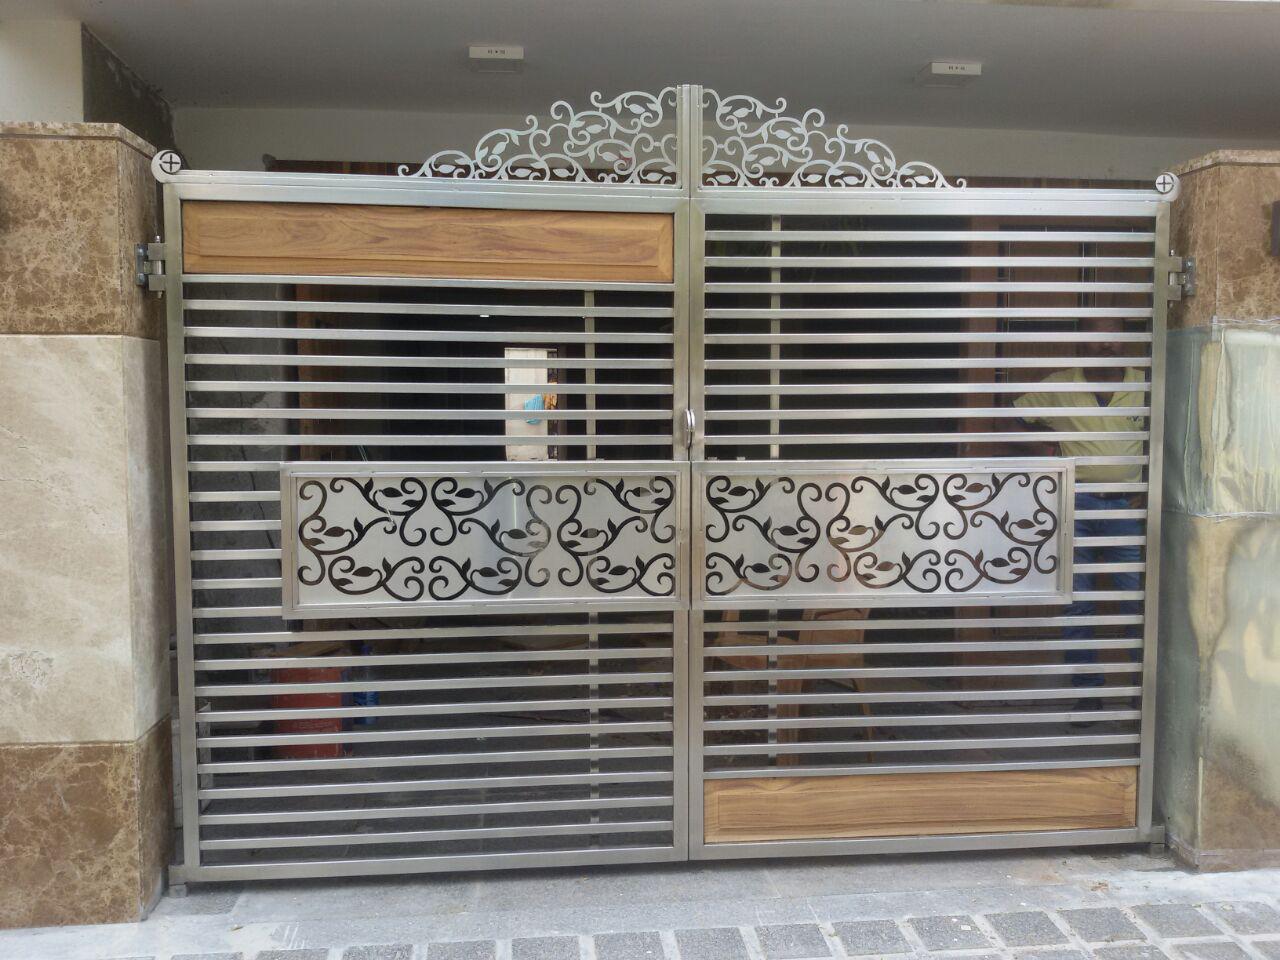 FOOT STEP   ss railing   stainless steel gate   balcony railing for Stainless Steel Gate Designs With Glass  587fsj